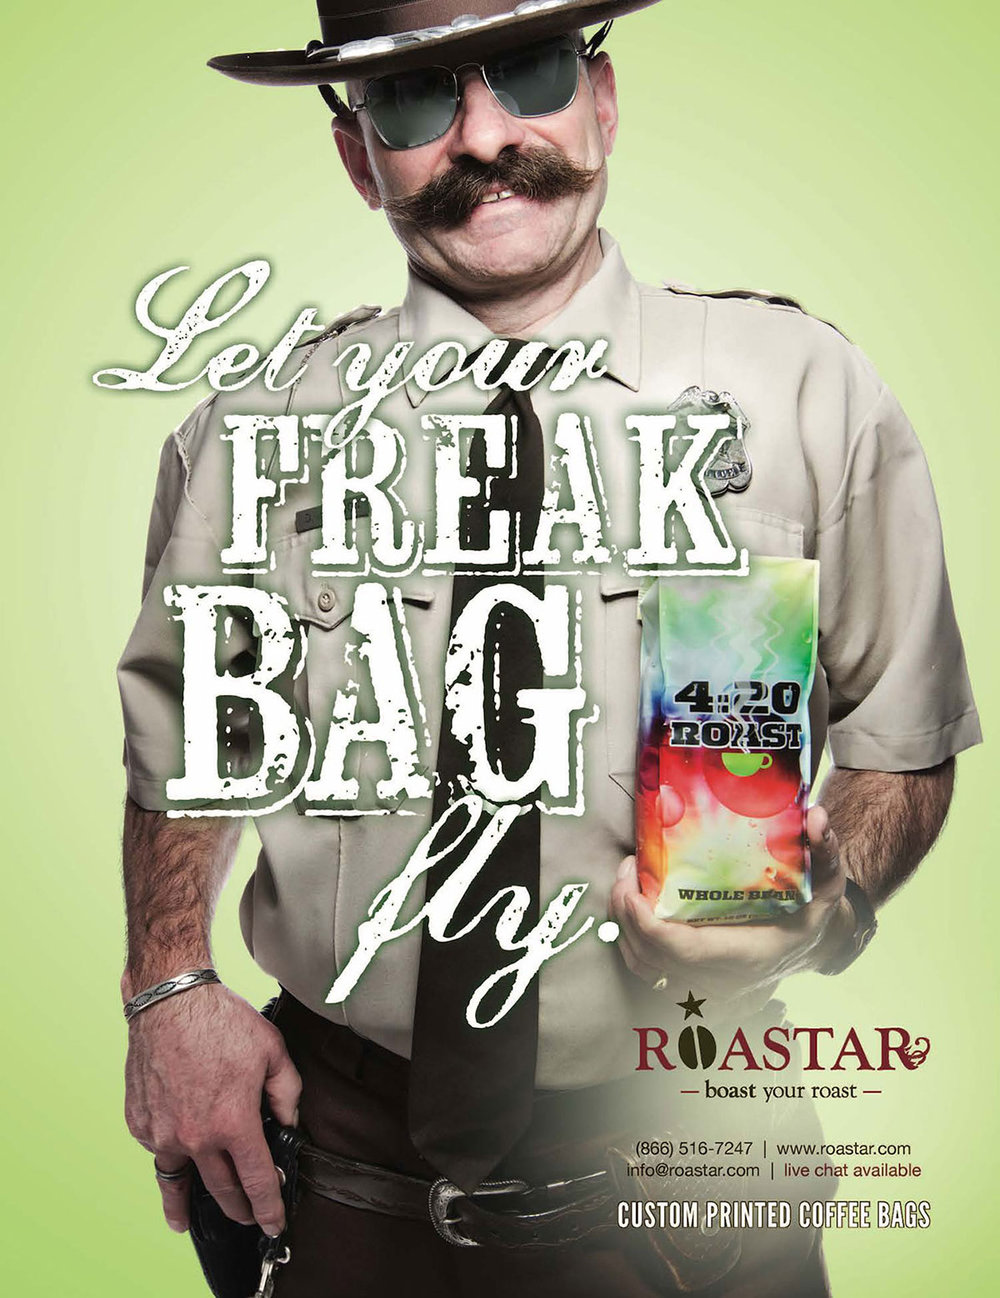 roastar_cop.jpg